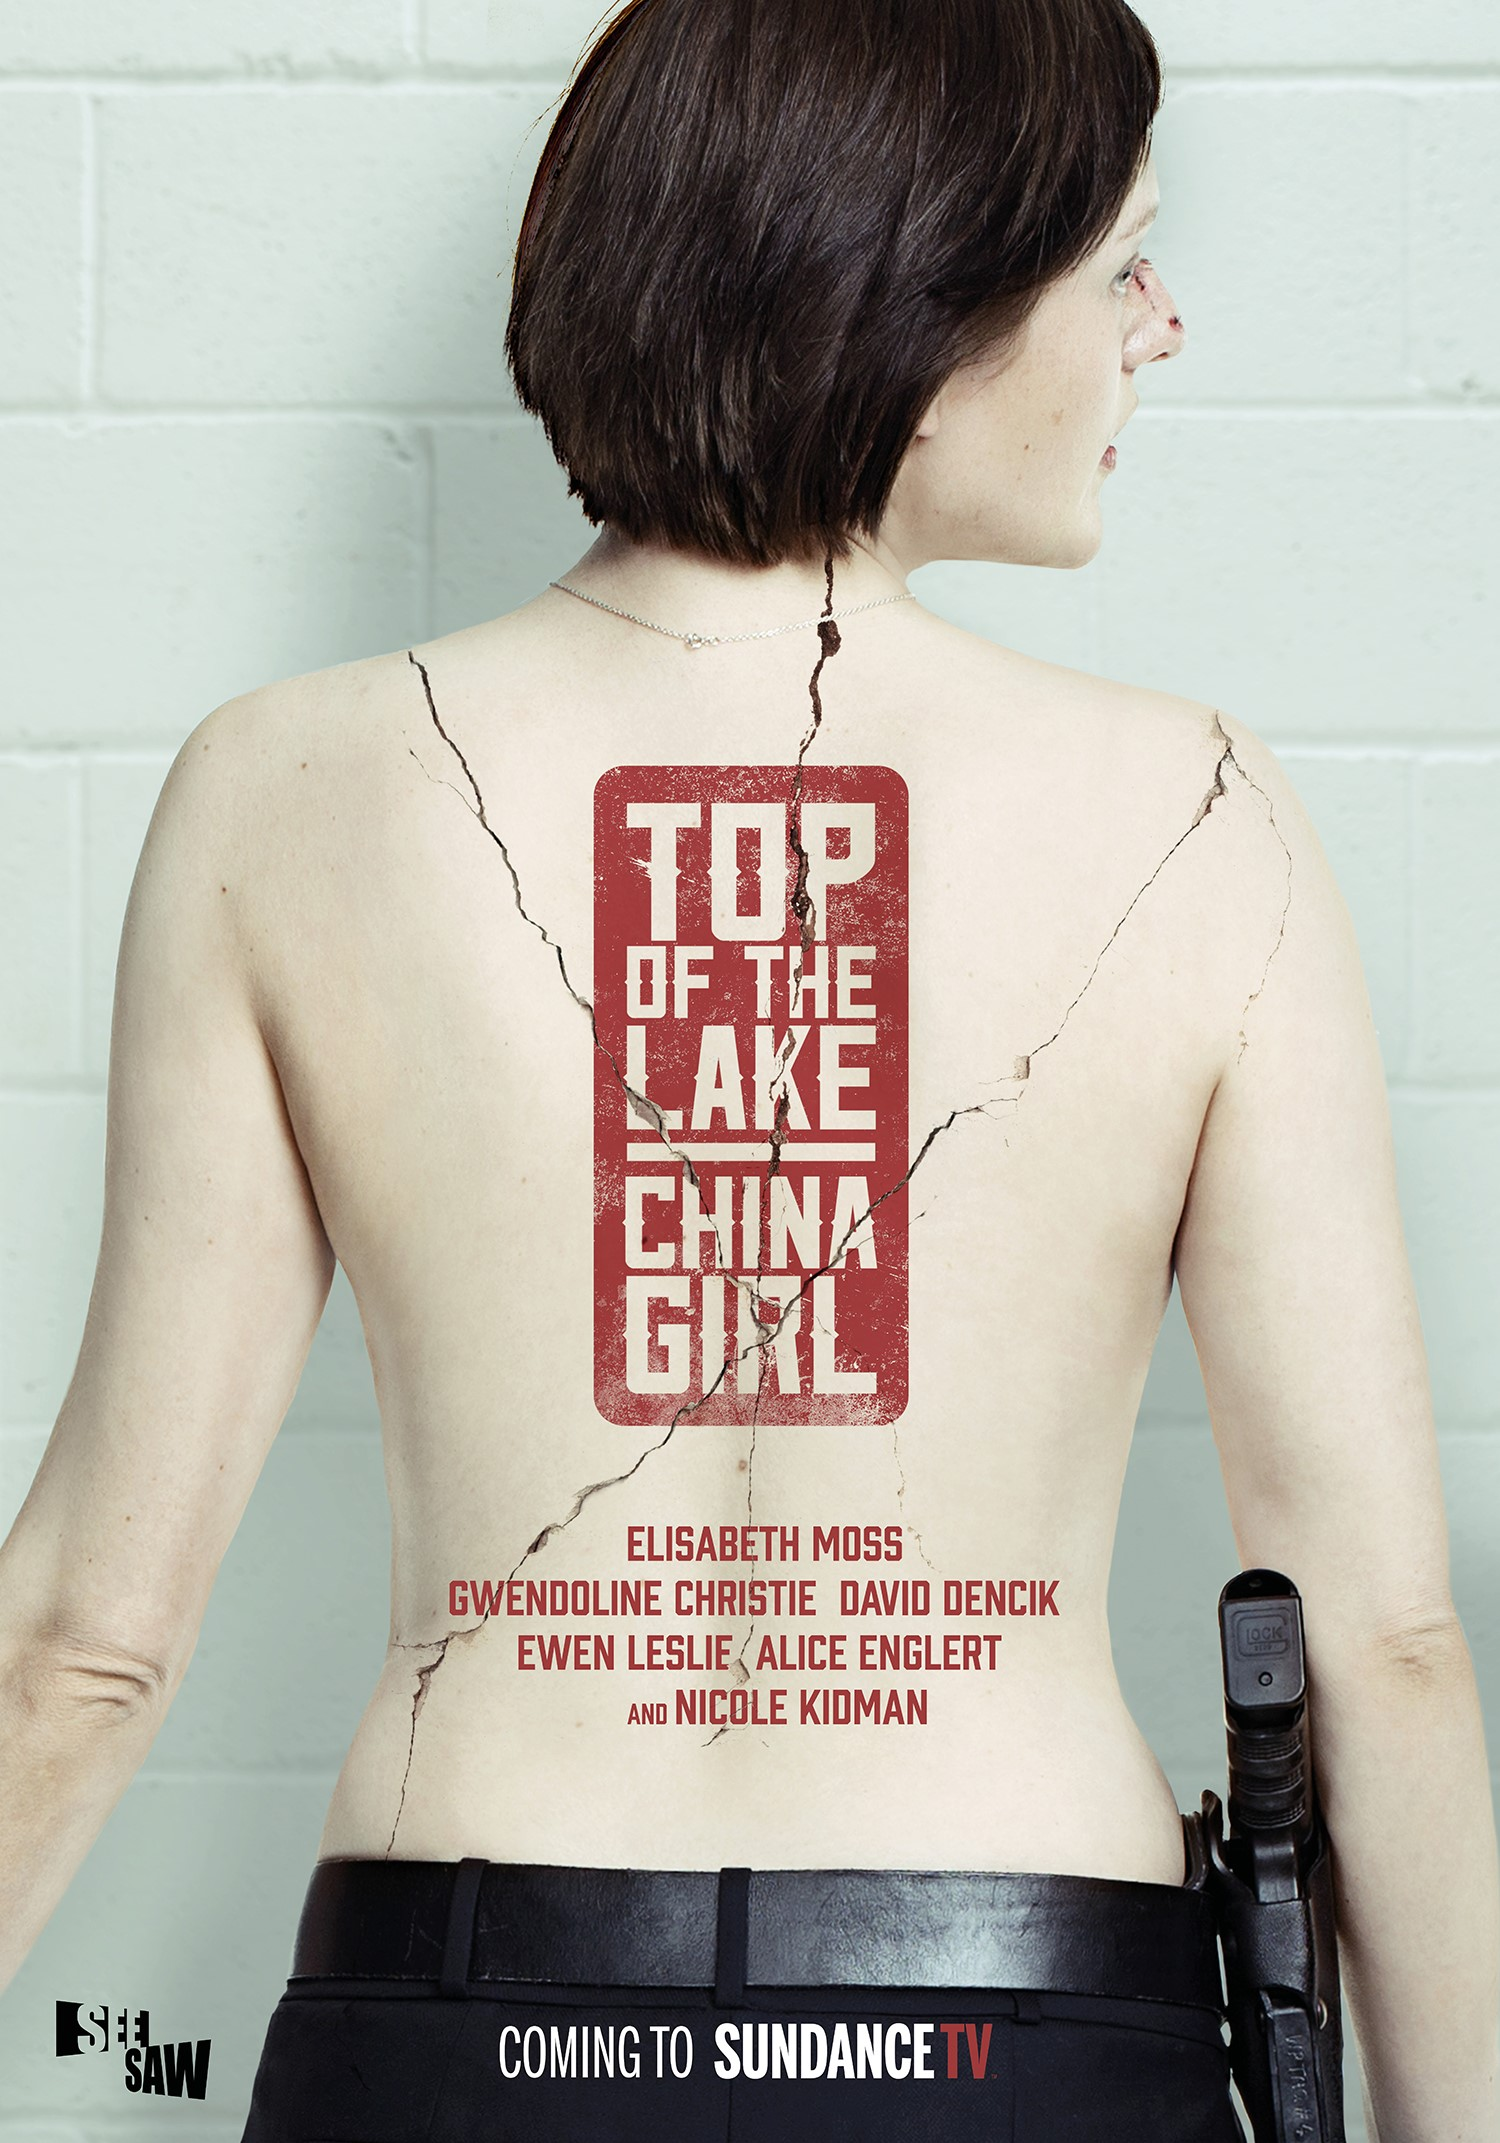 Jane Campion - Top of the lake : China girl